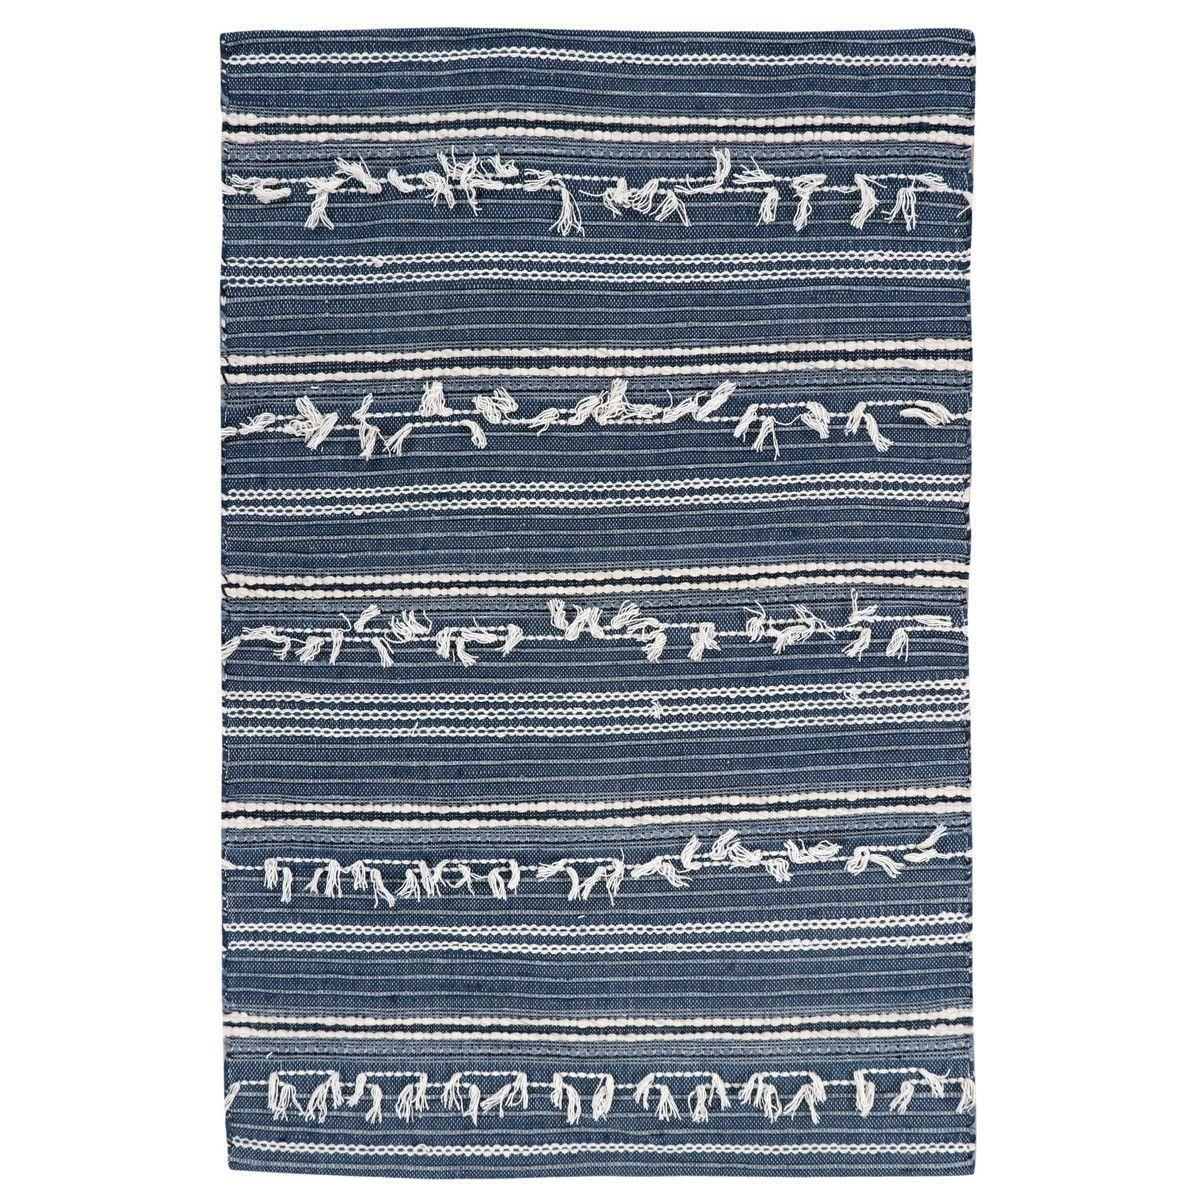 Noir Handwoven Wool Rug, 280x190cm, Denim